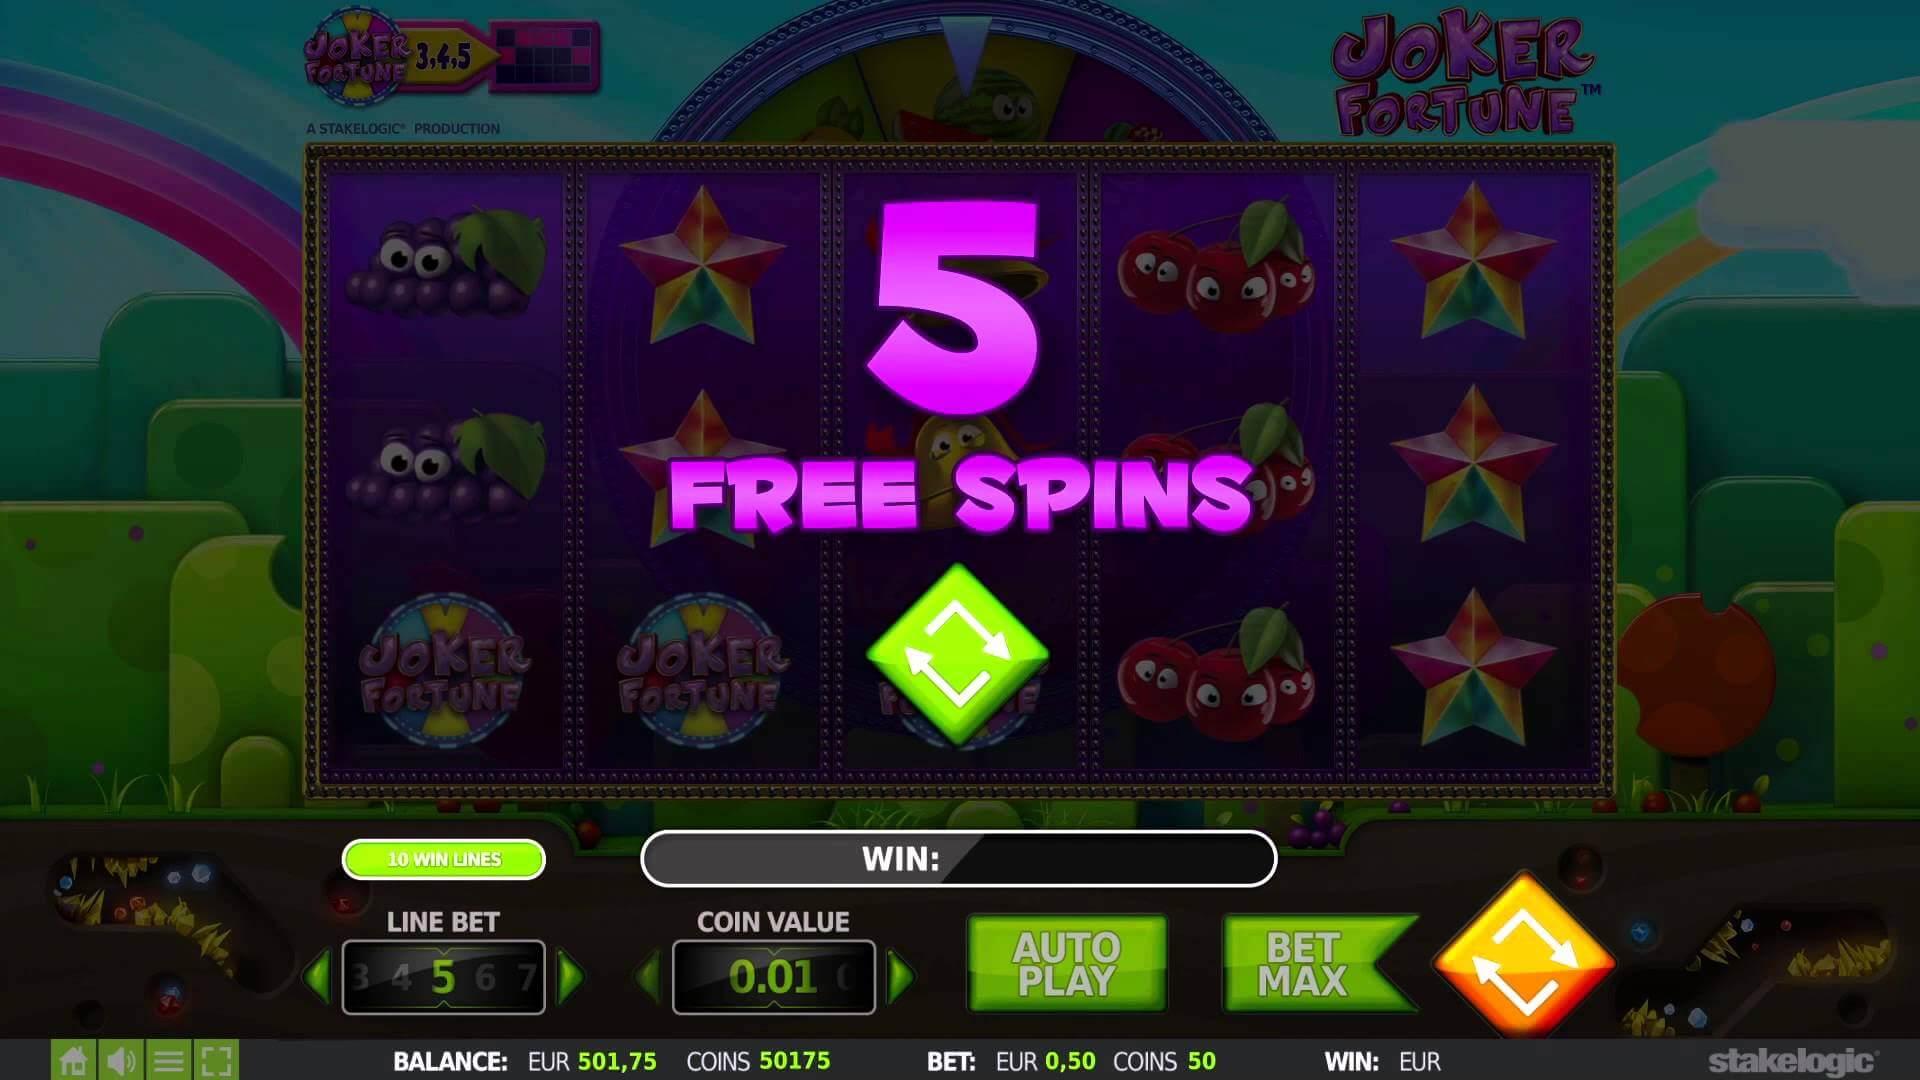 Joker Fortune Gokkast Free Spins